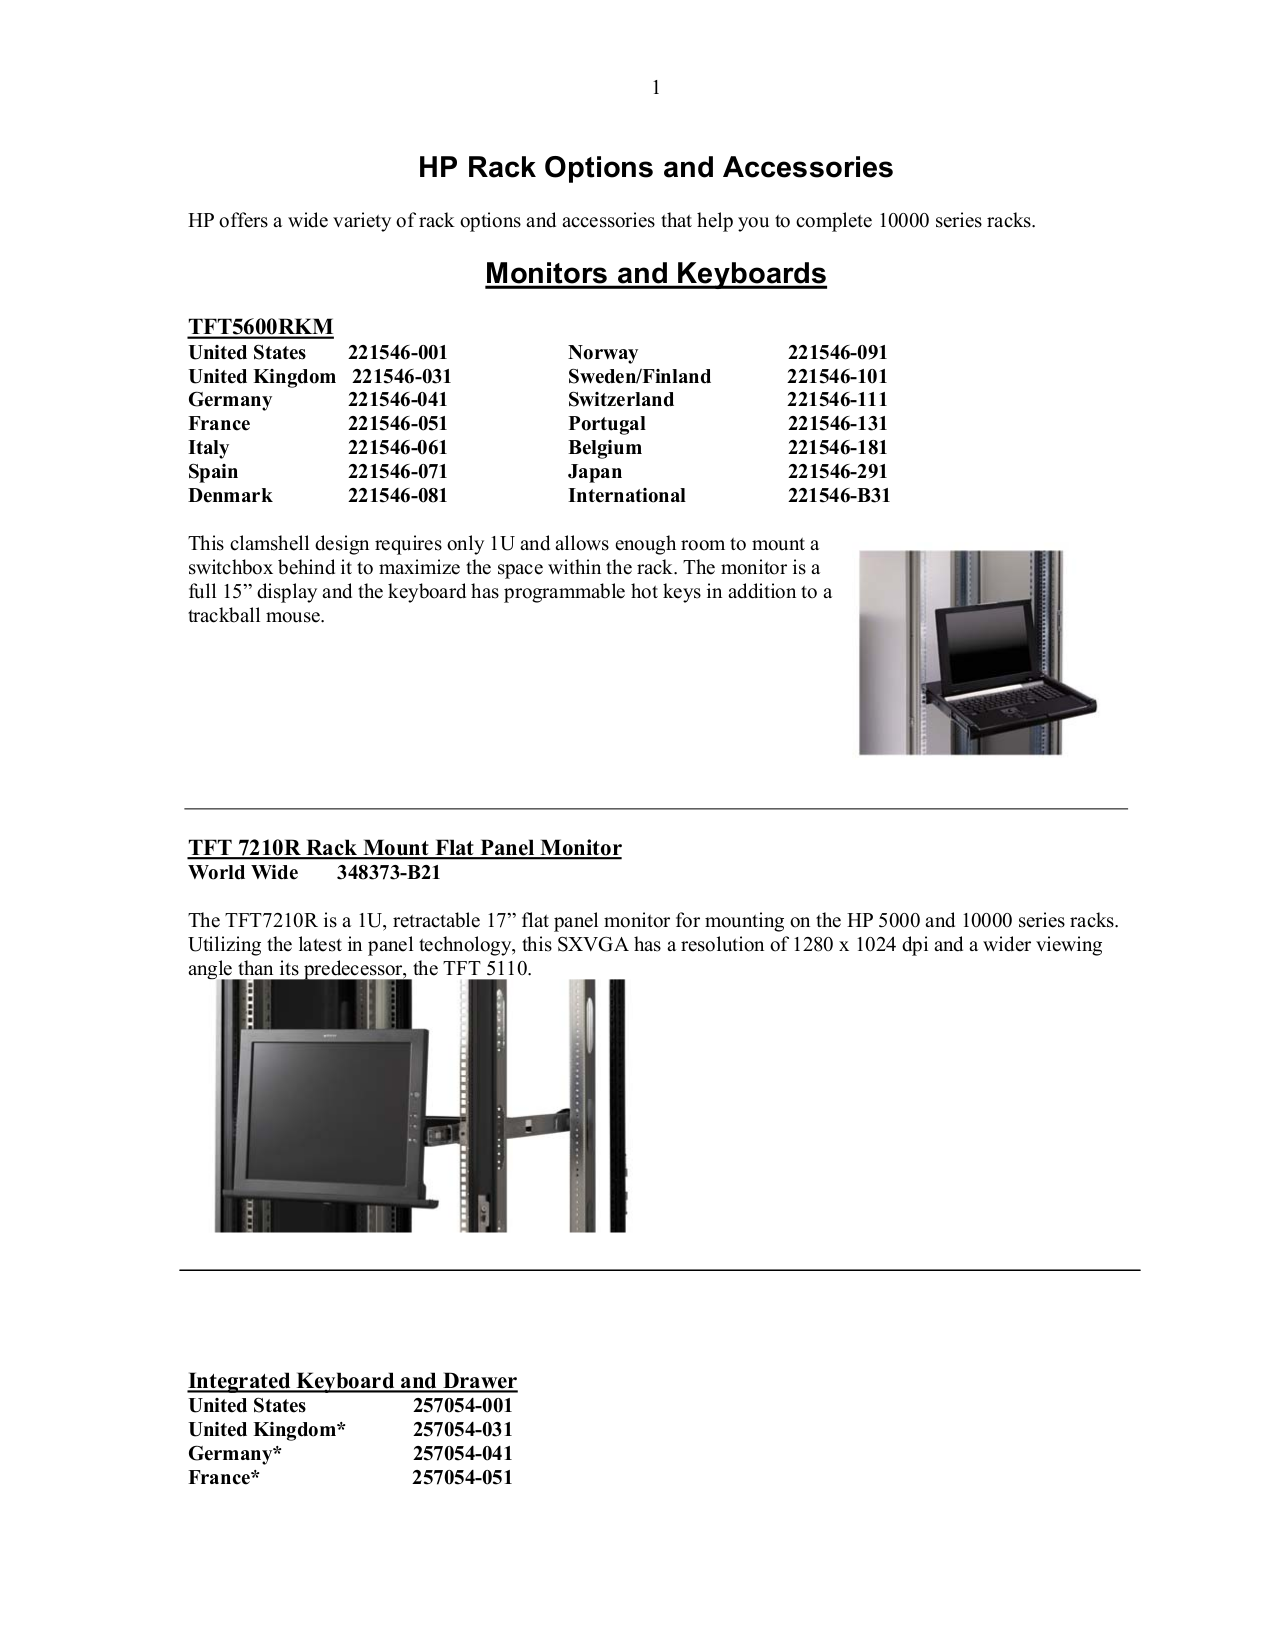 hp monitor pe1245 manual pdf